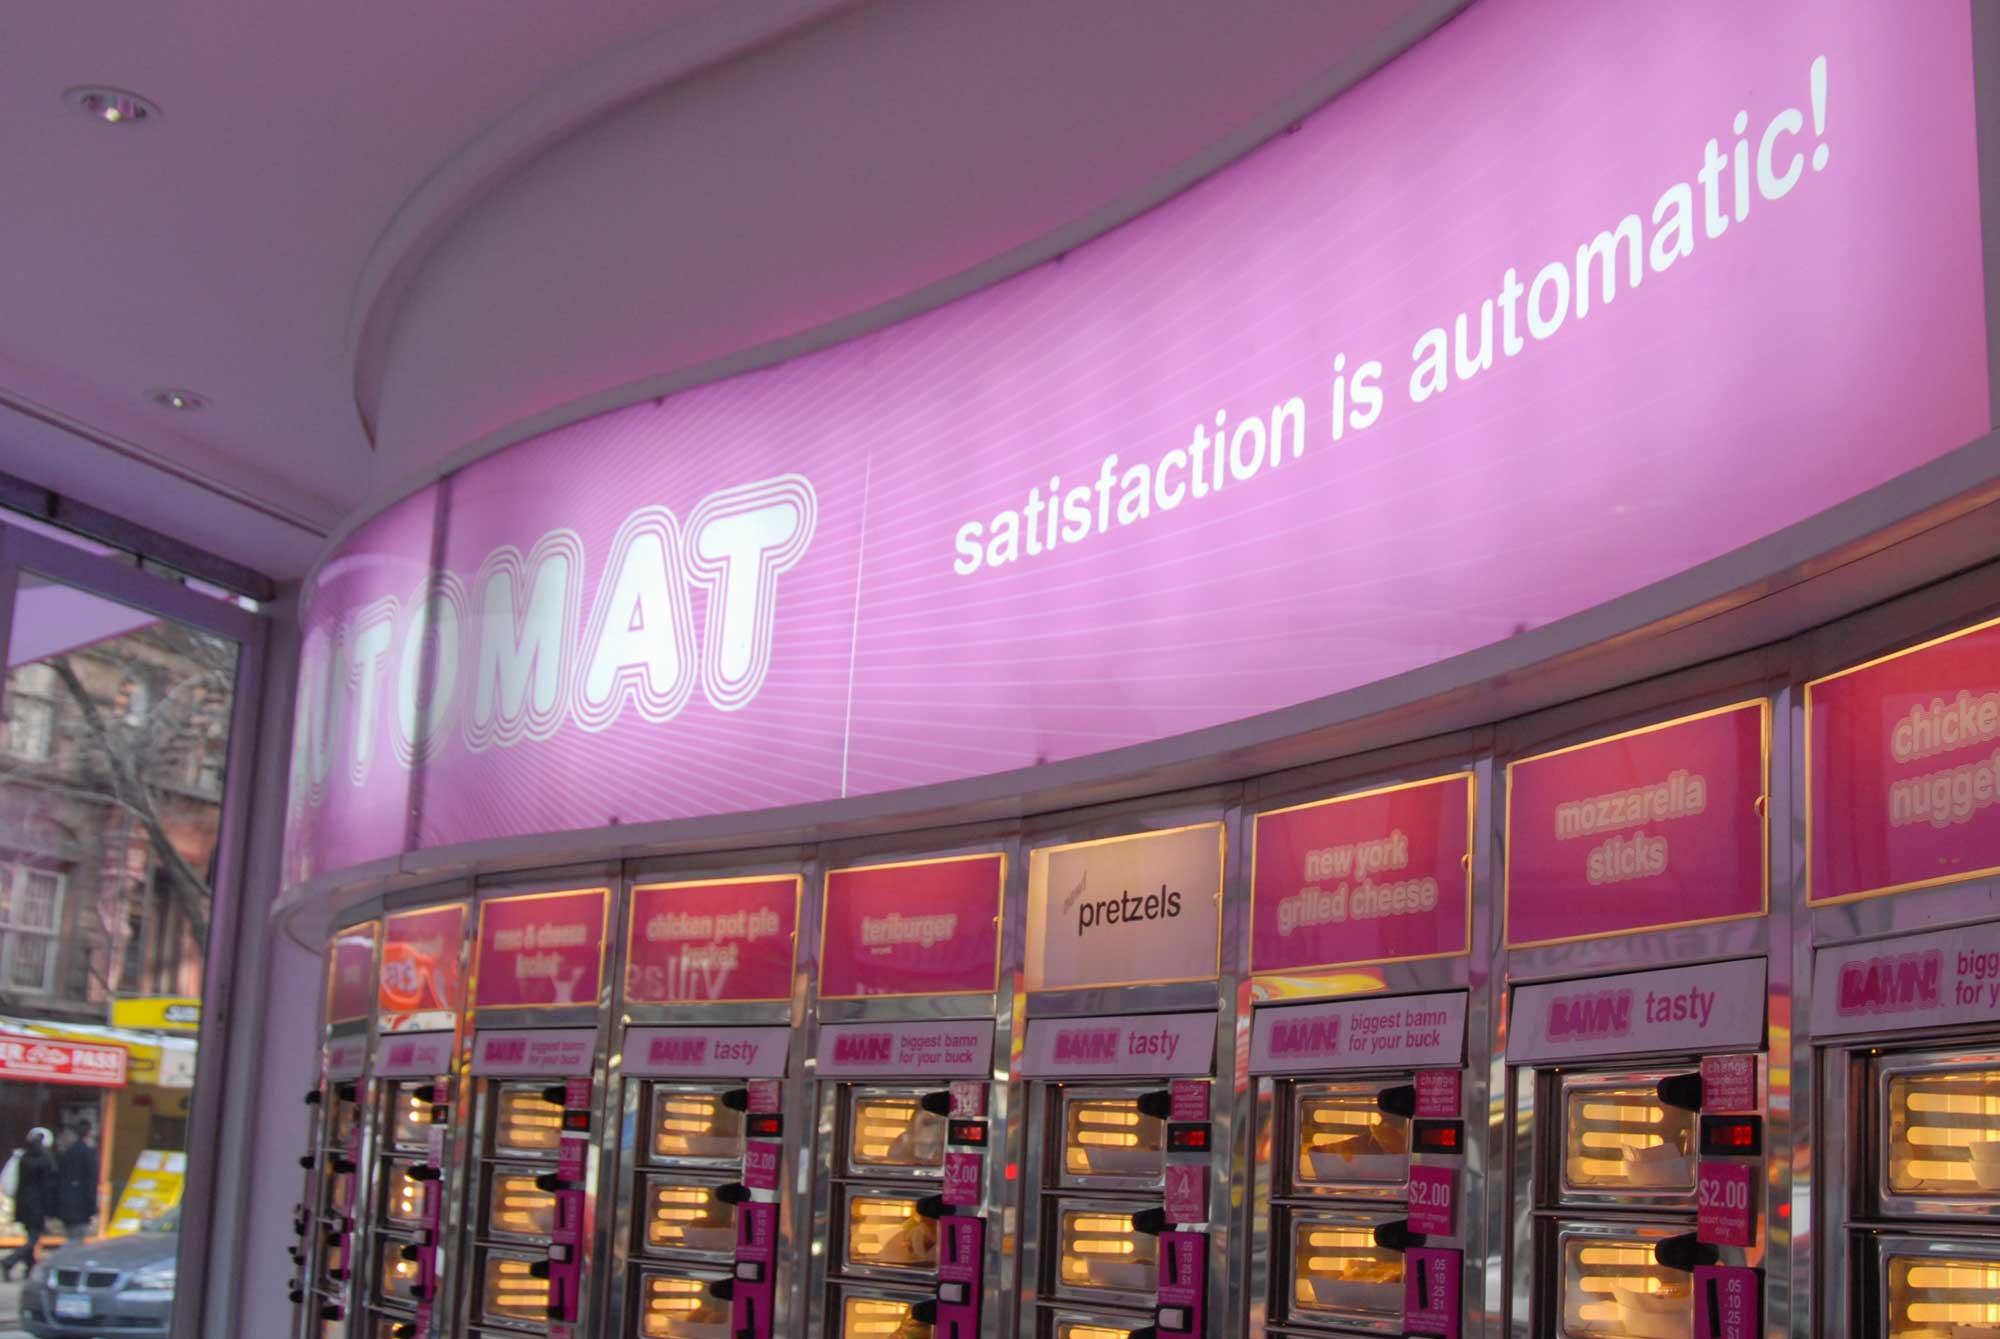 Bamn-Automat-New-York--stenberg-3885.jpg